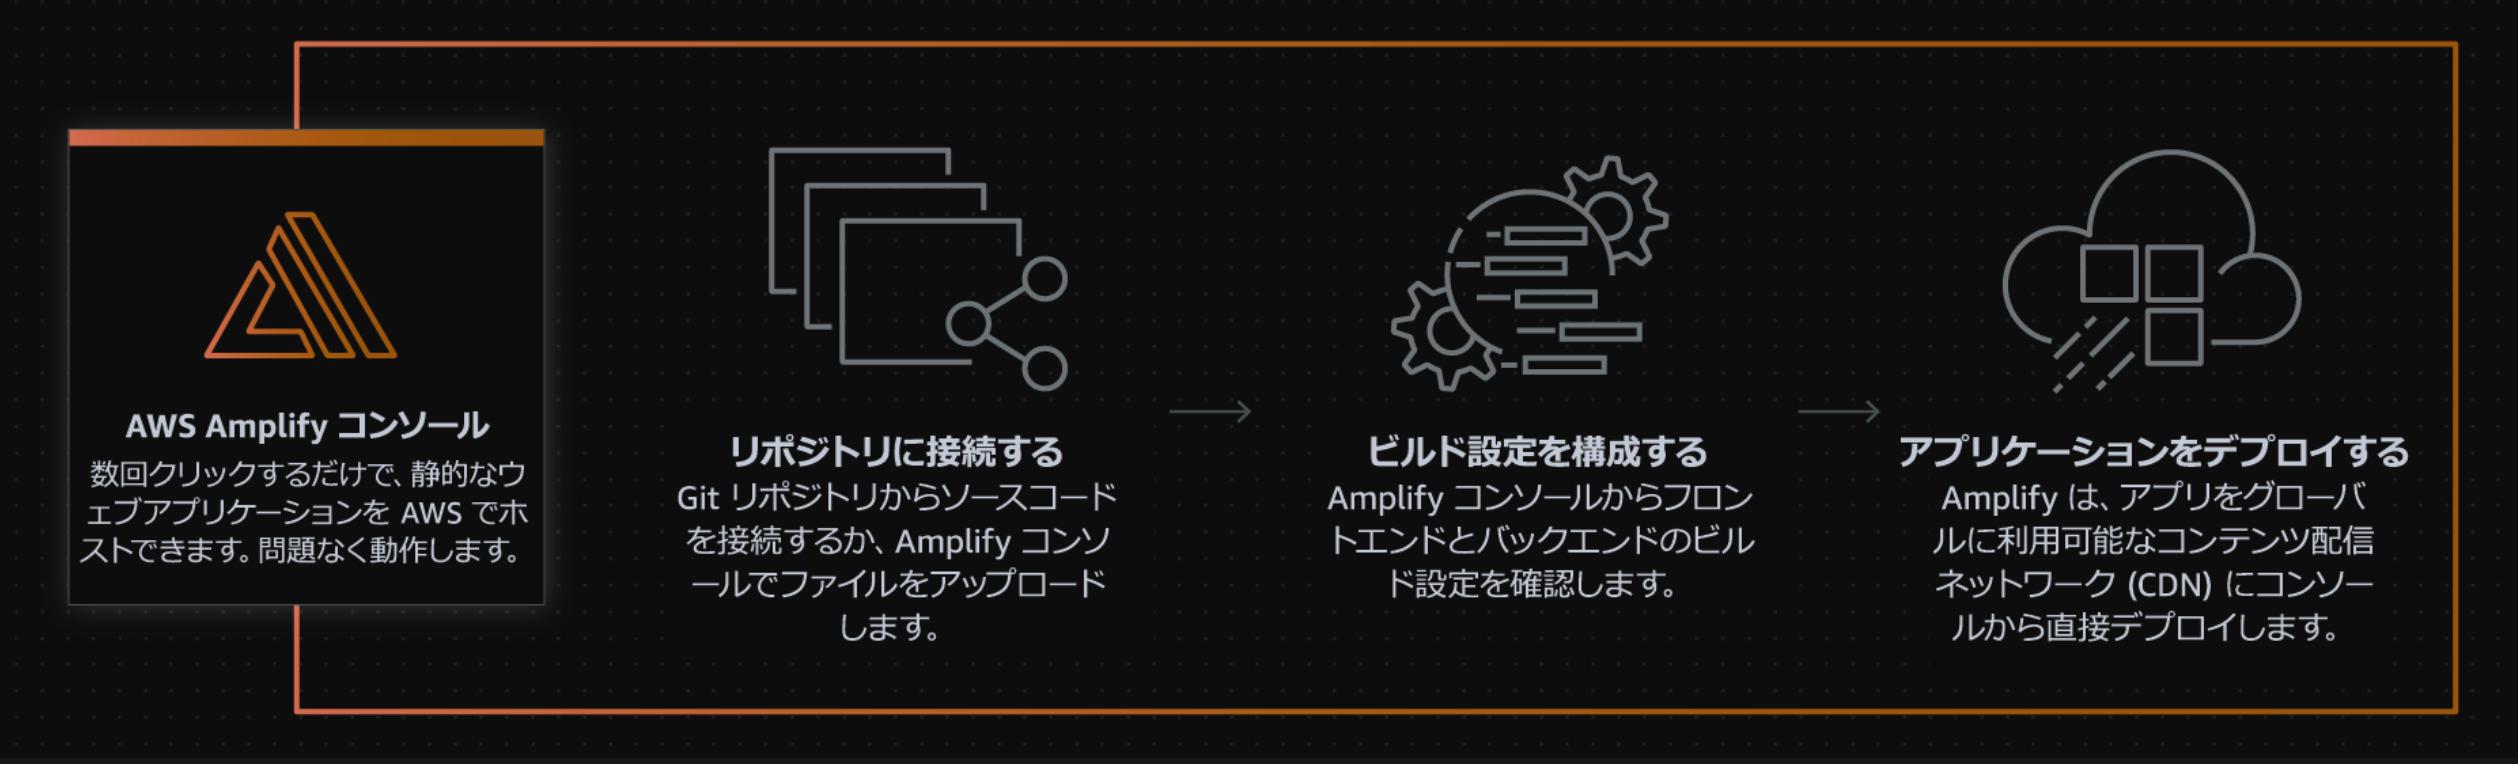 Amplify Console